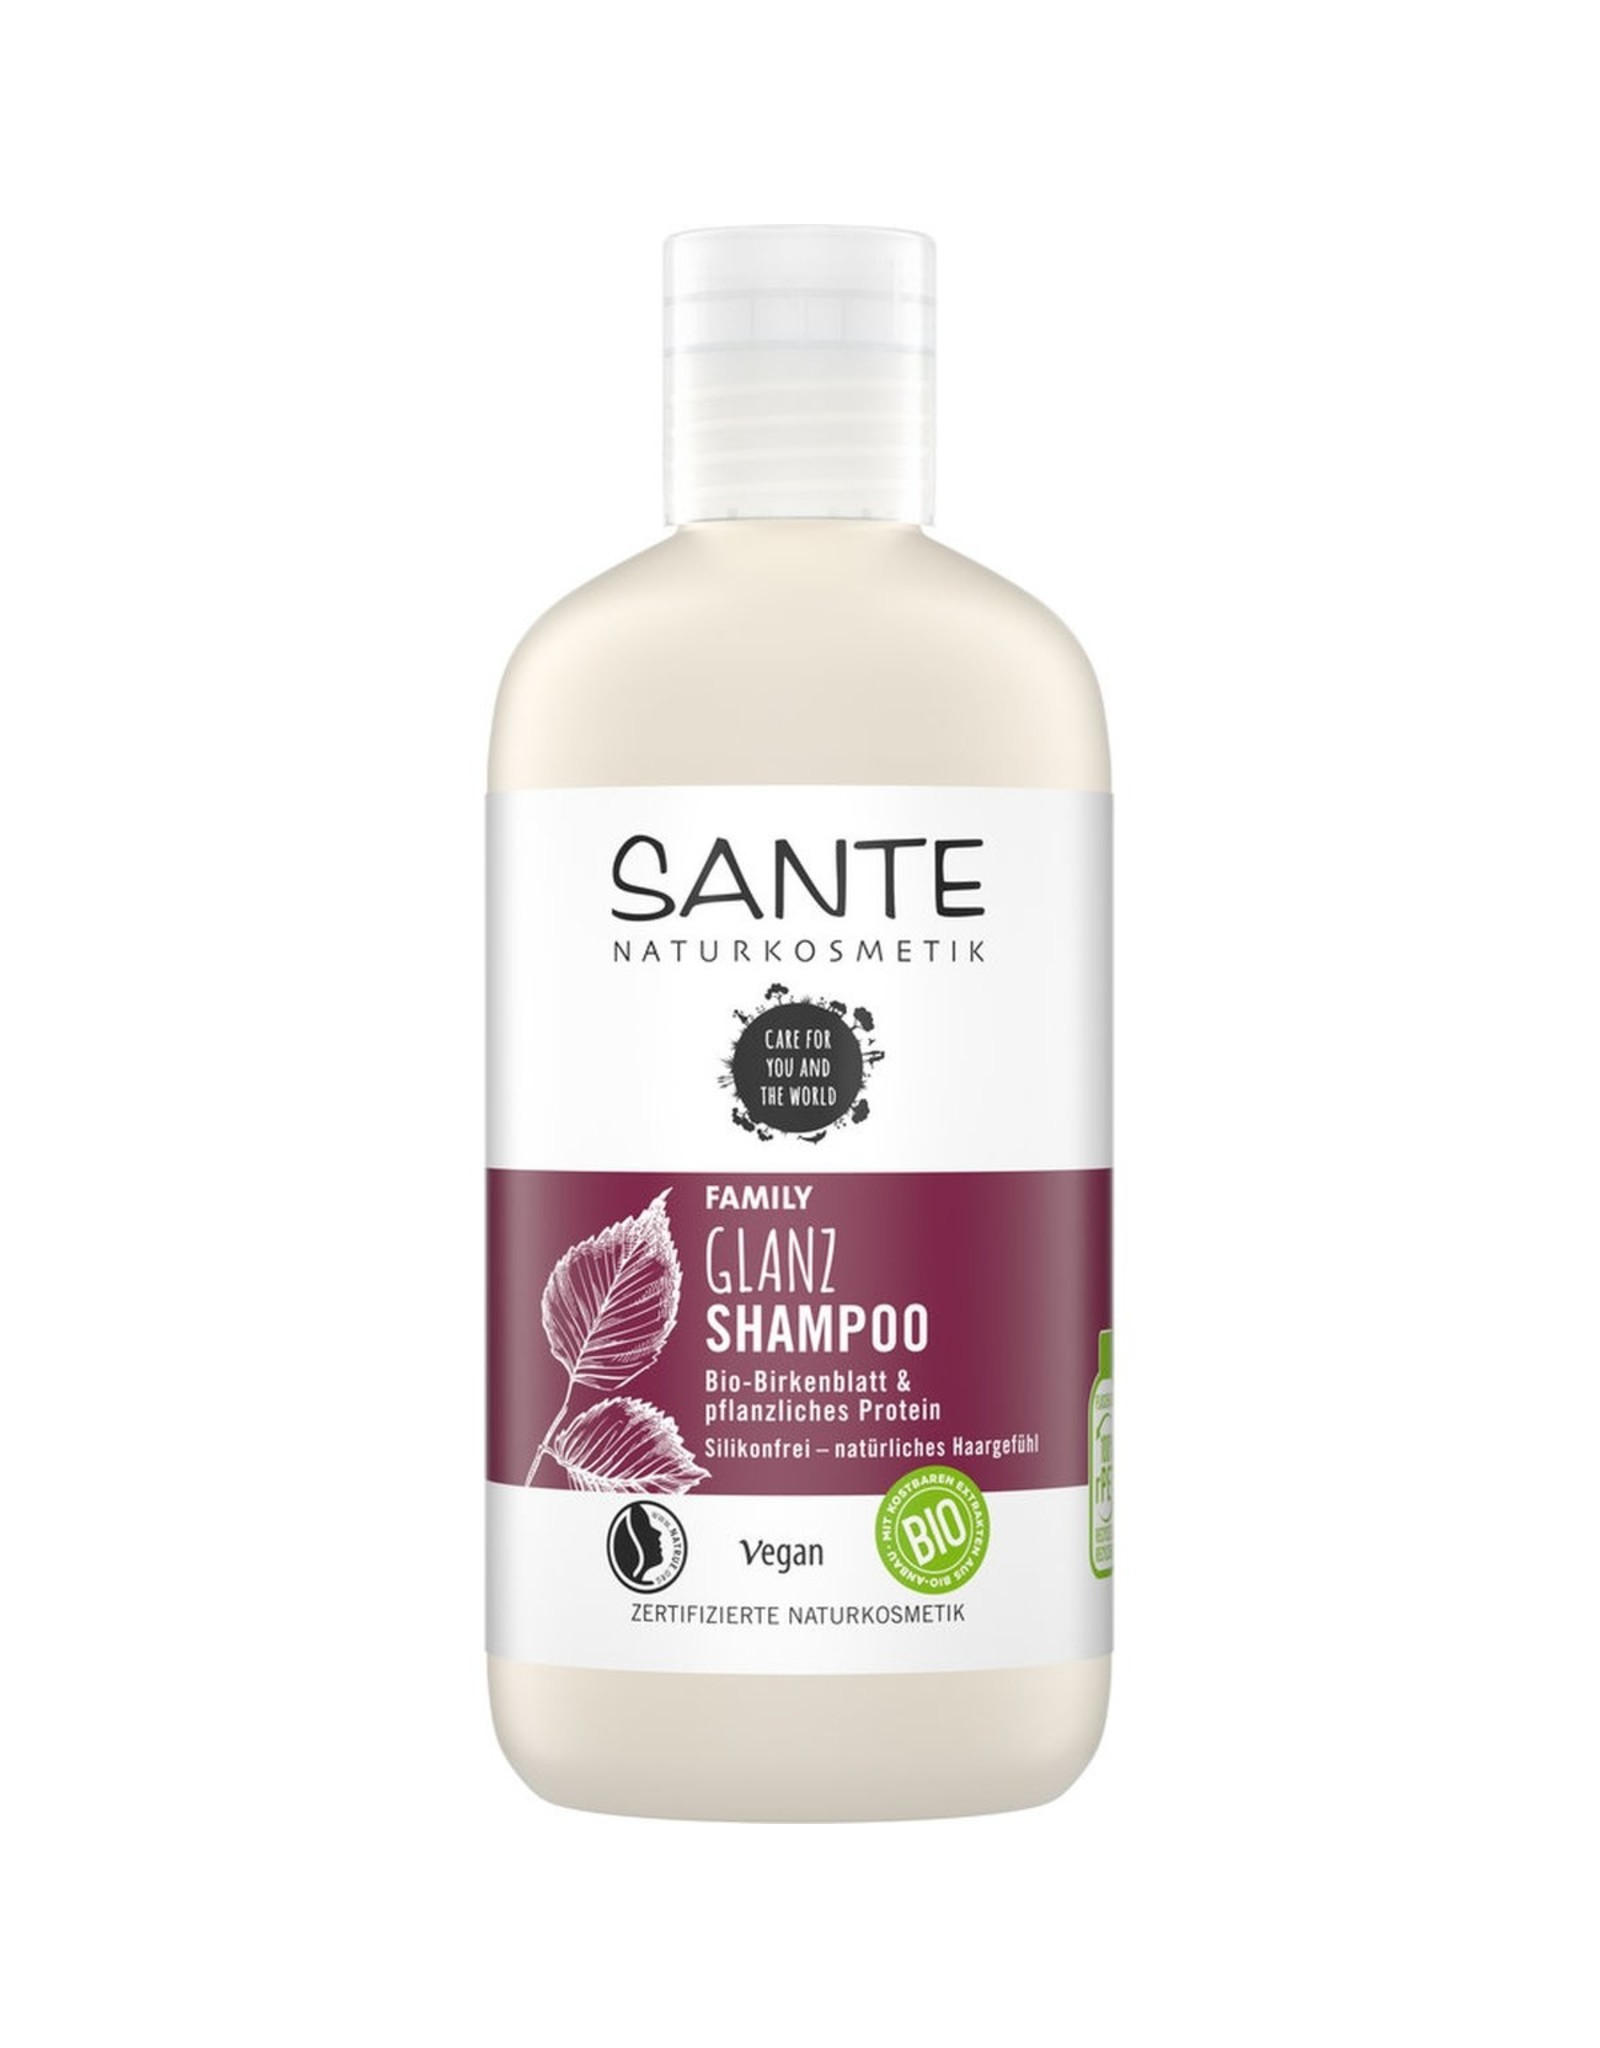 SANTE Family Glanz Shampoo Bio-Birkenblatt & pflanzl. Protein 250ml